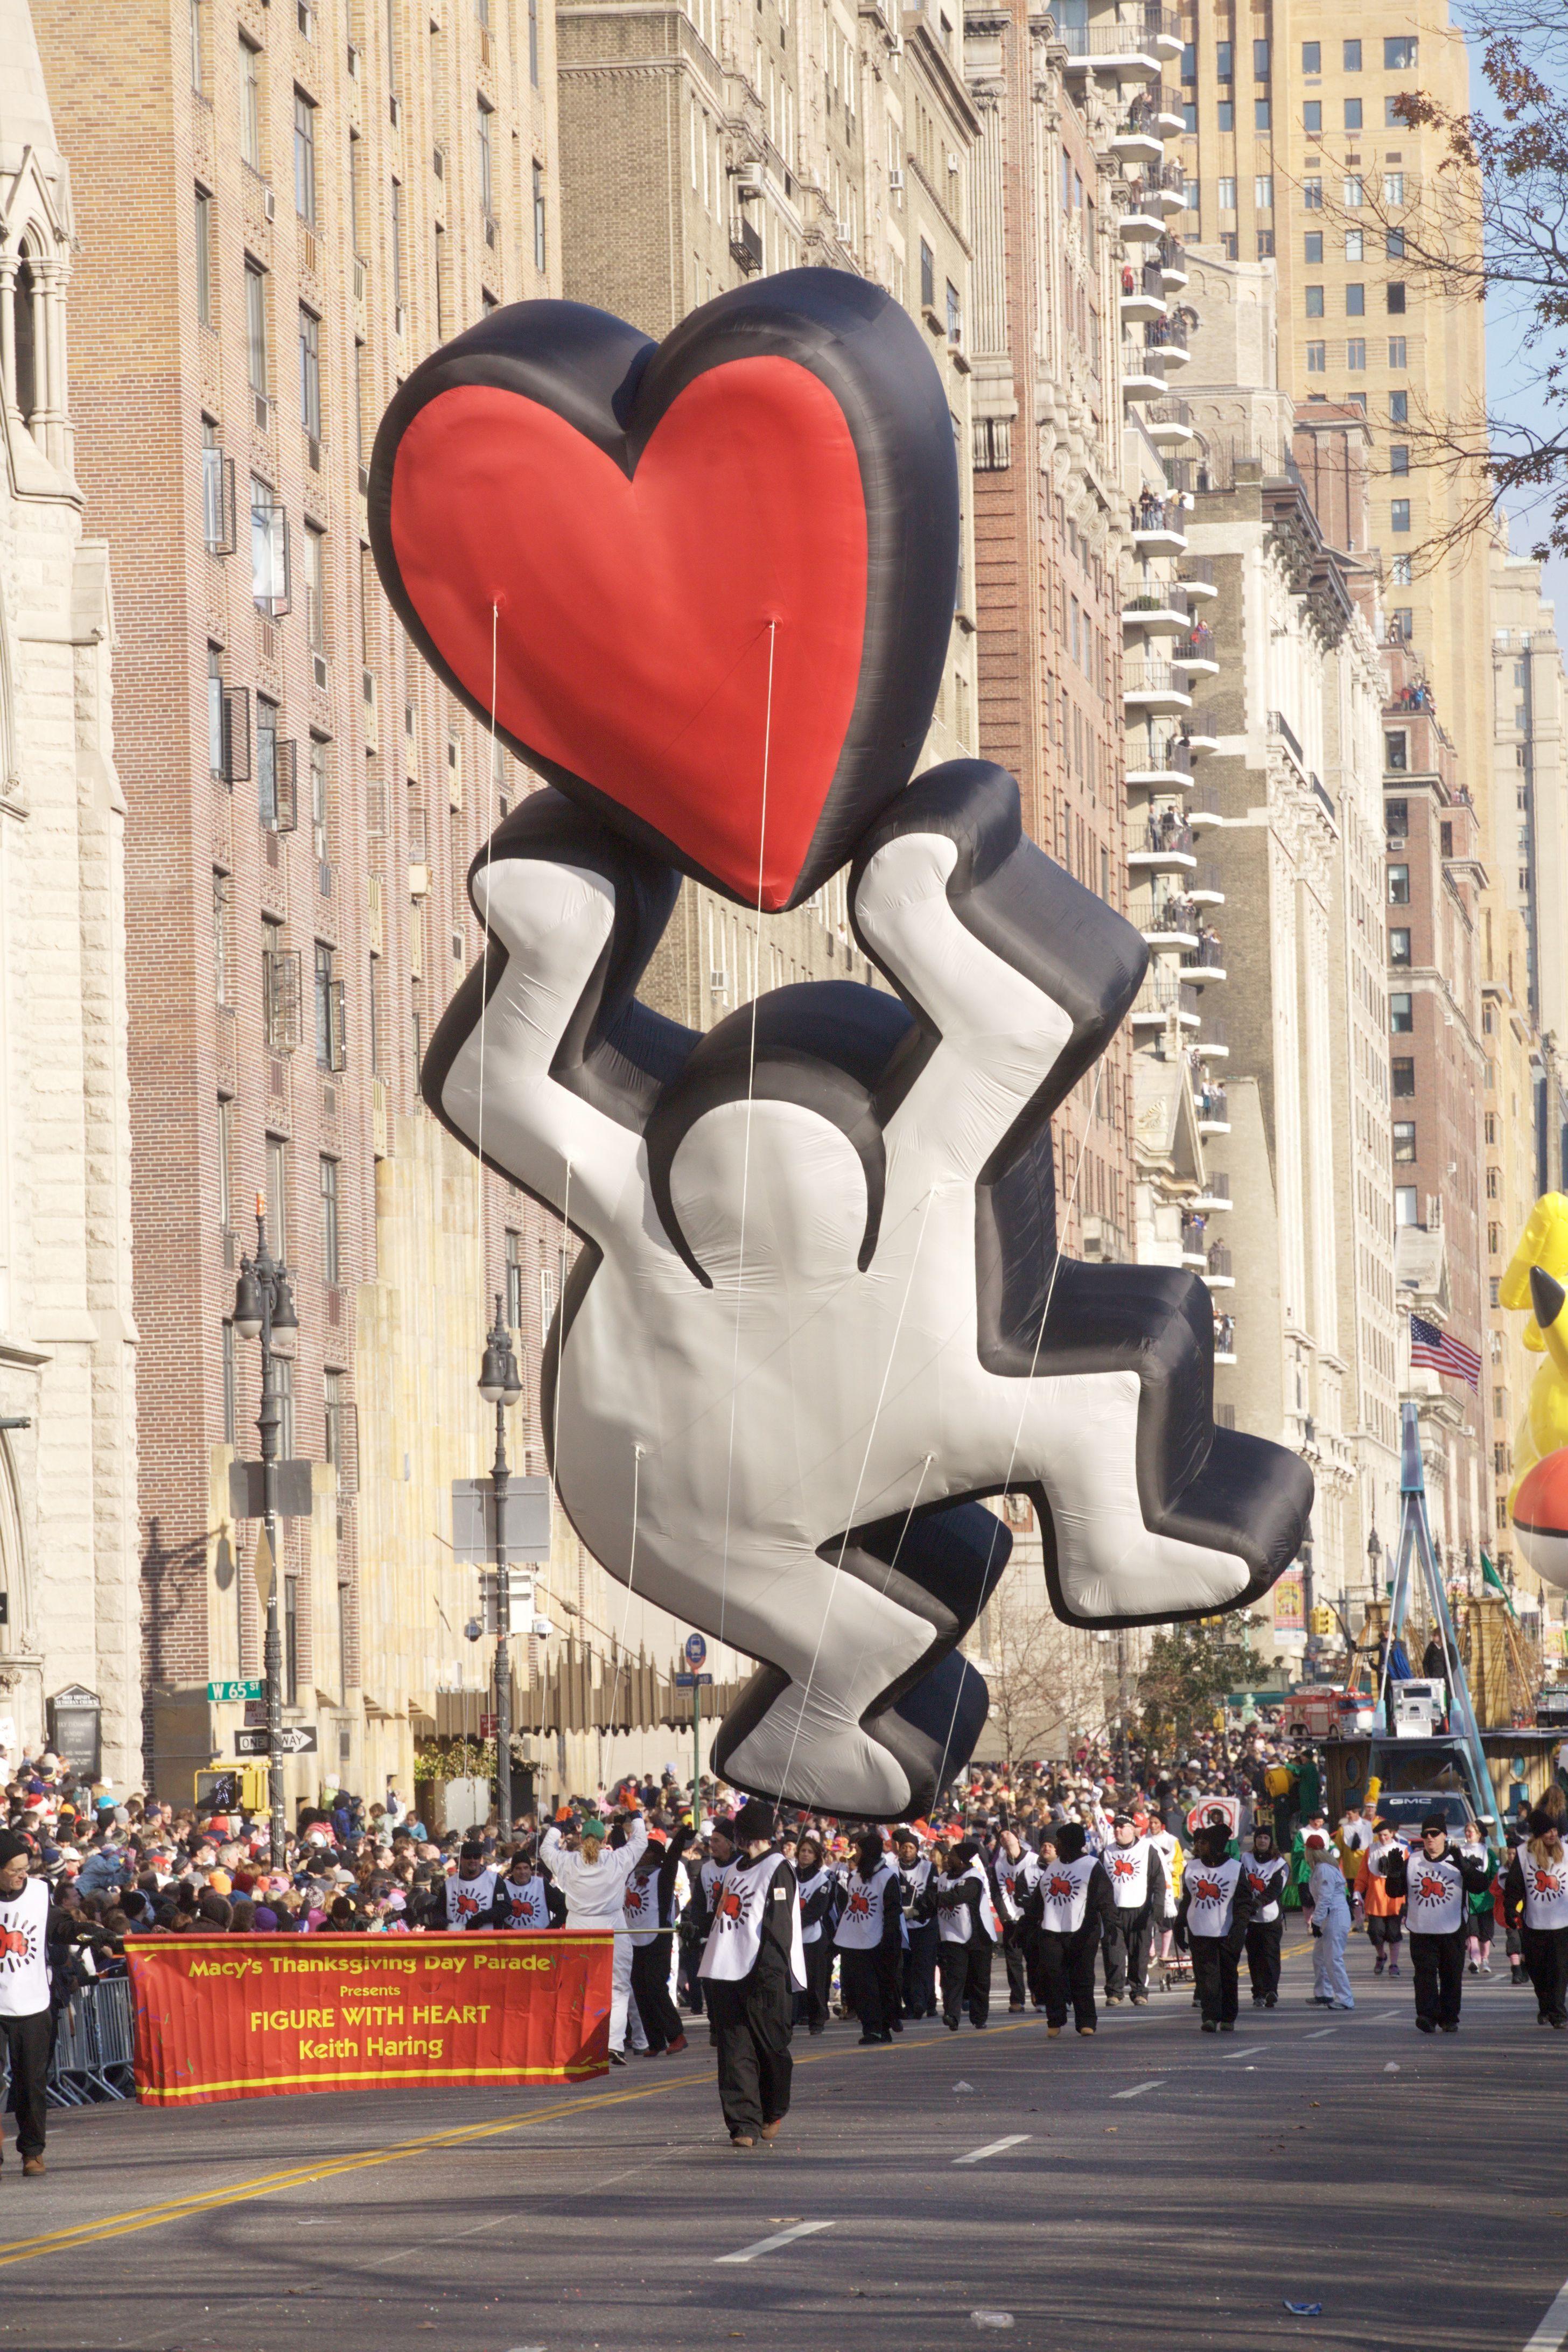 Keith Haring Balloon Macy's Thanksgiving Day Parade